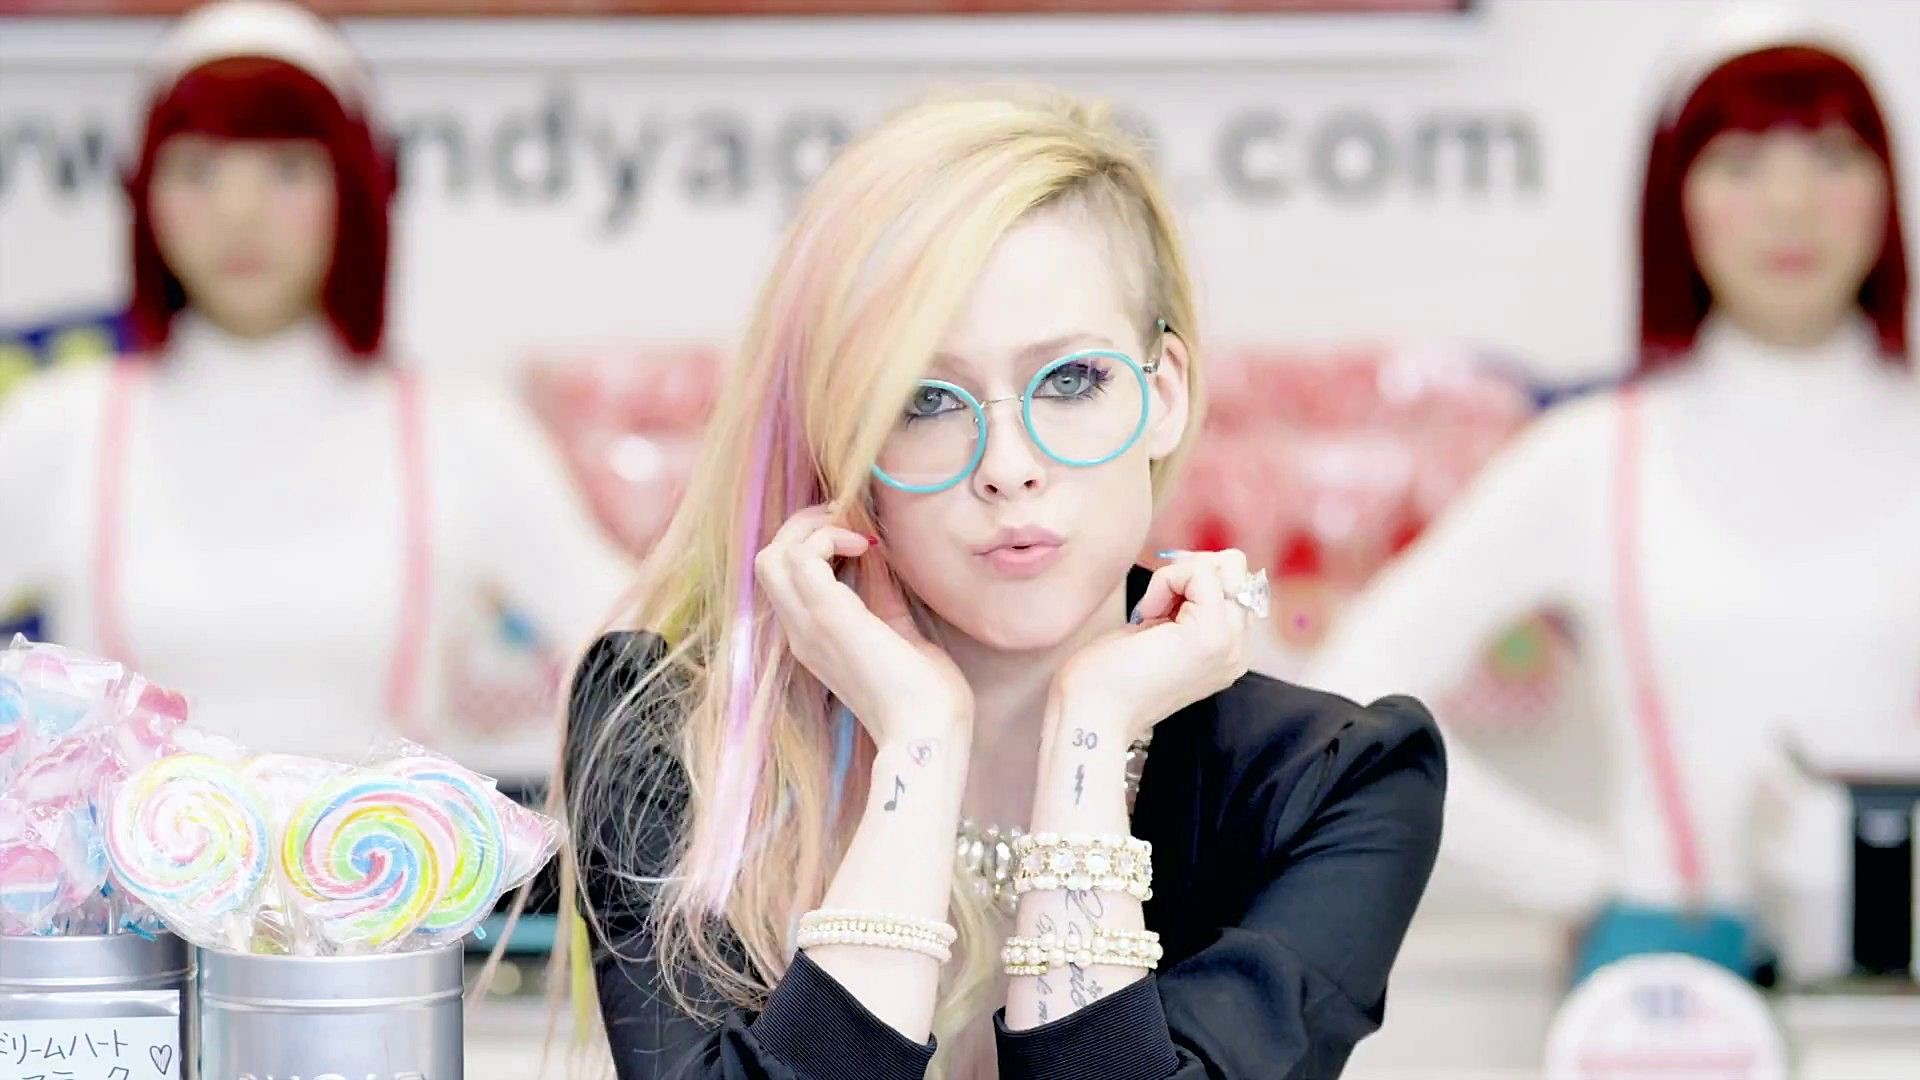 Avril lavigne hello kitty - 2 2